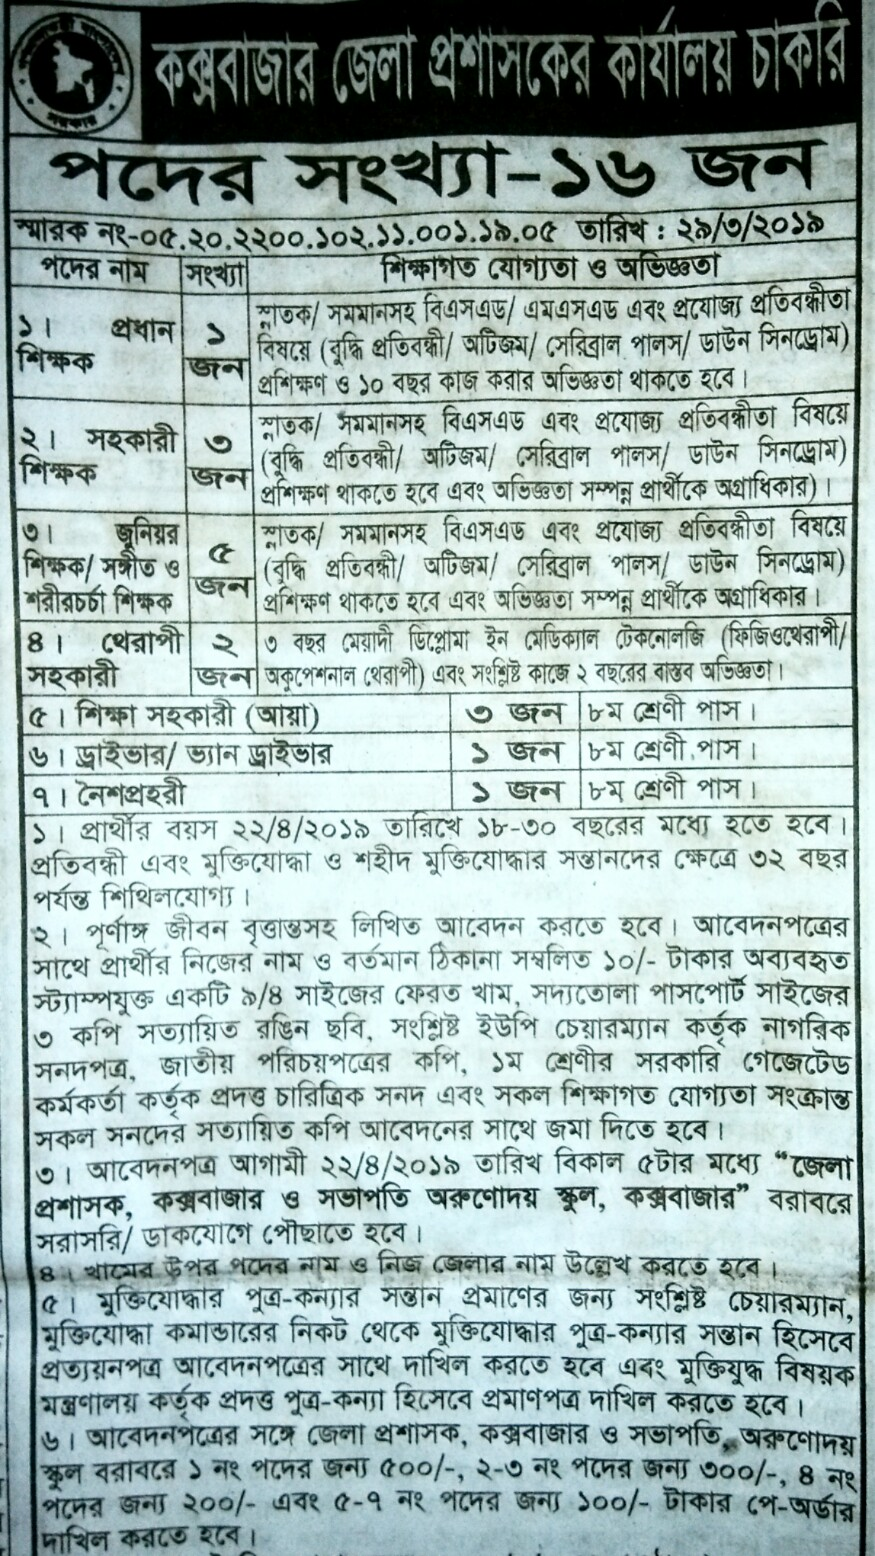 Cox's Bazar Deputy Commissioner's Office job circular 2019. কক্সবাজার জেলা প্রশাসকের কার্যলয় নিয়োগ বিজ্ঞপ্তি ২০১৯